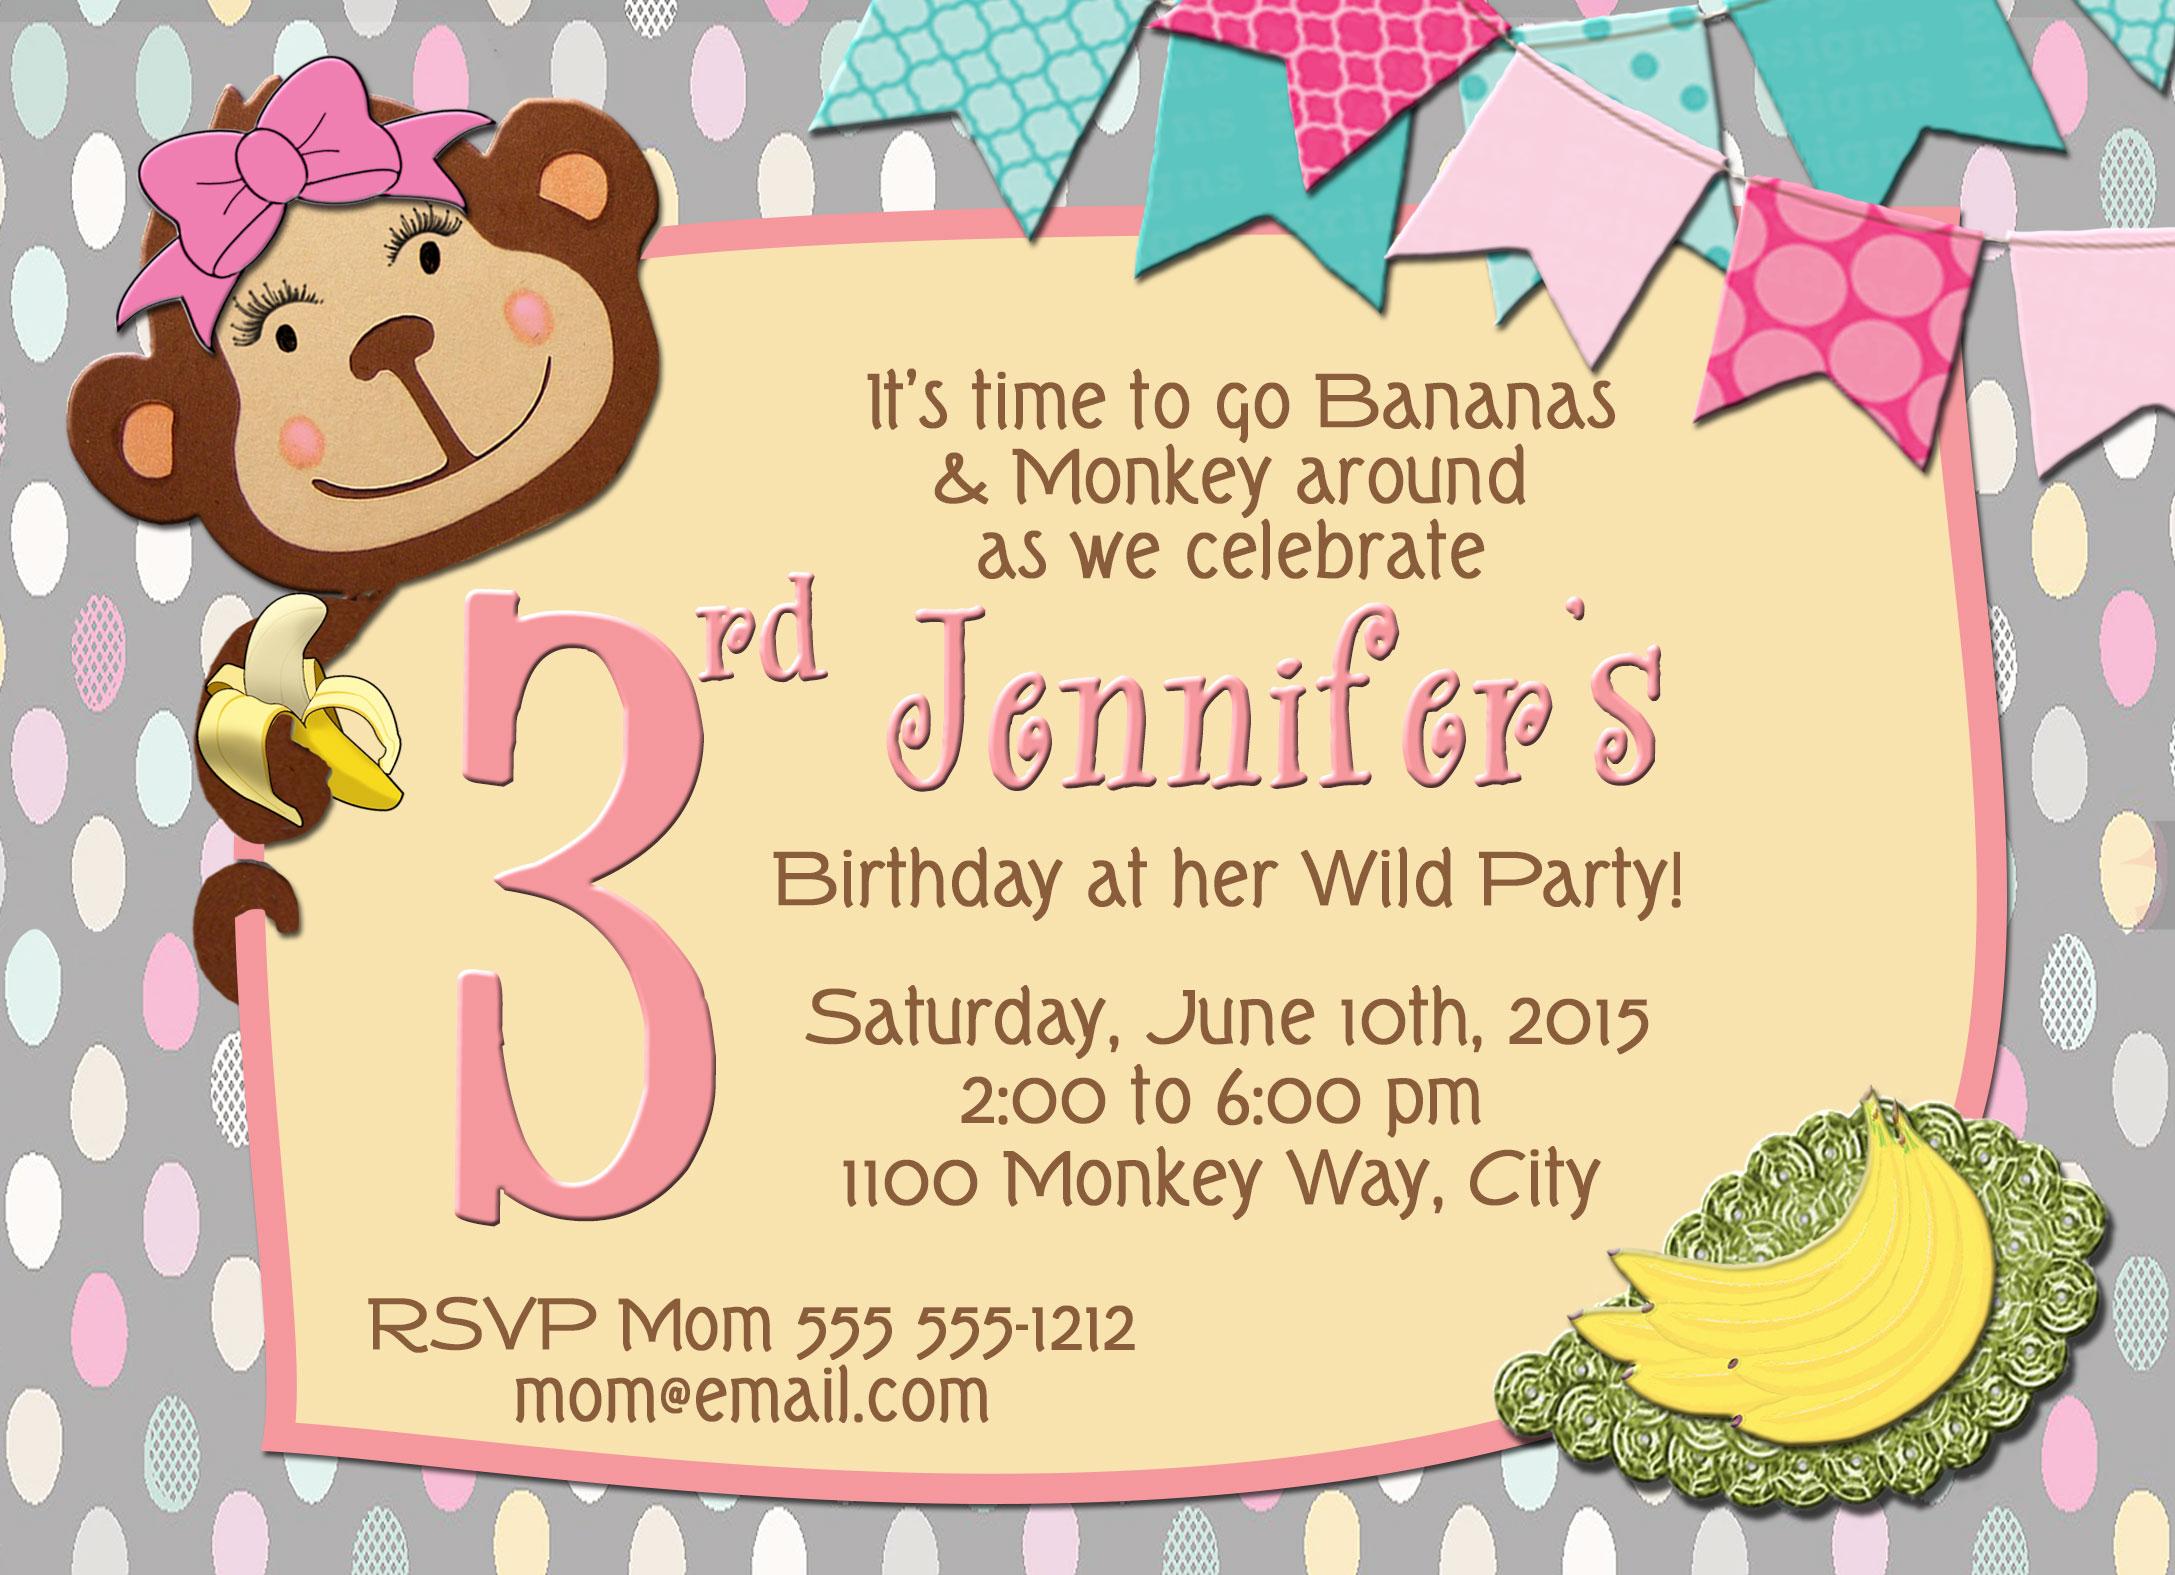 Monkey Girl Wild Party Personalized Birthday Invitation 2 Sided ...